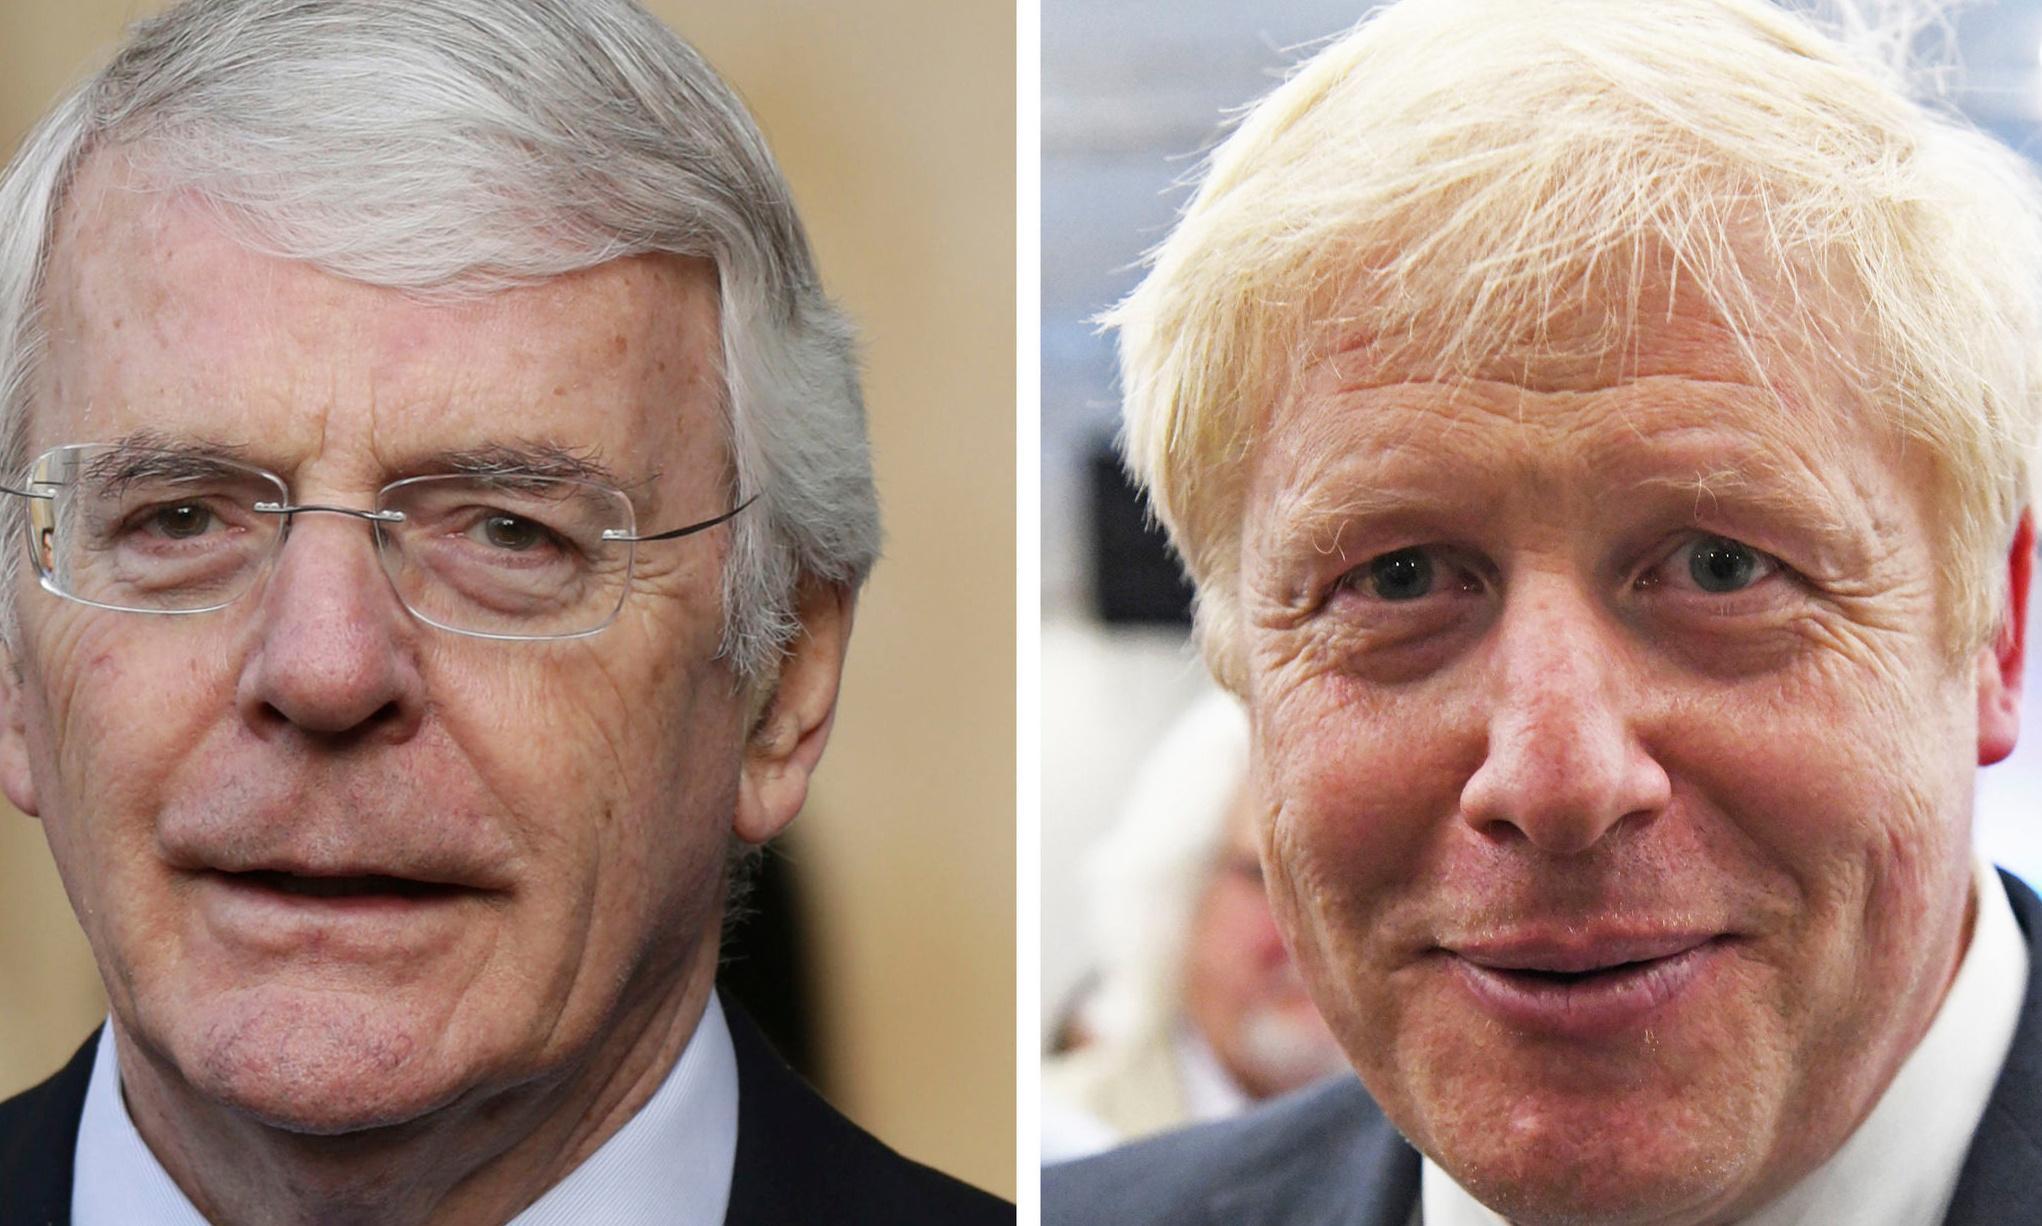 John Major takes aim at Dominic Cummings for 'poisoning' politics